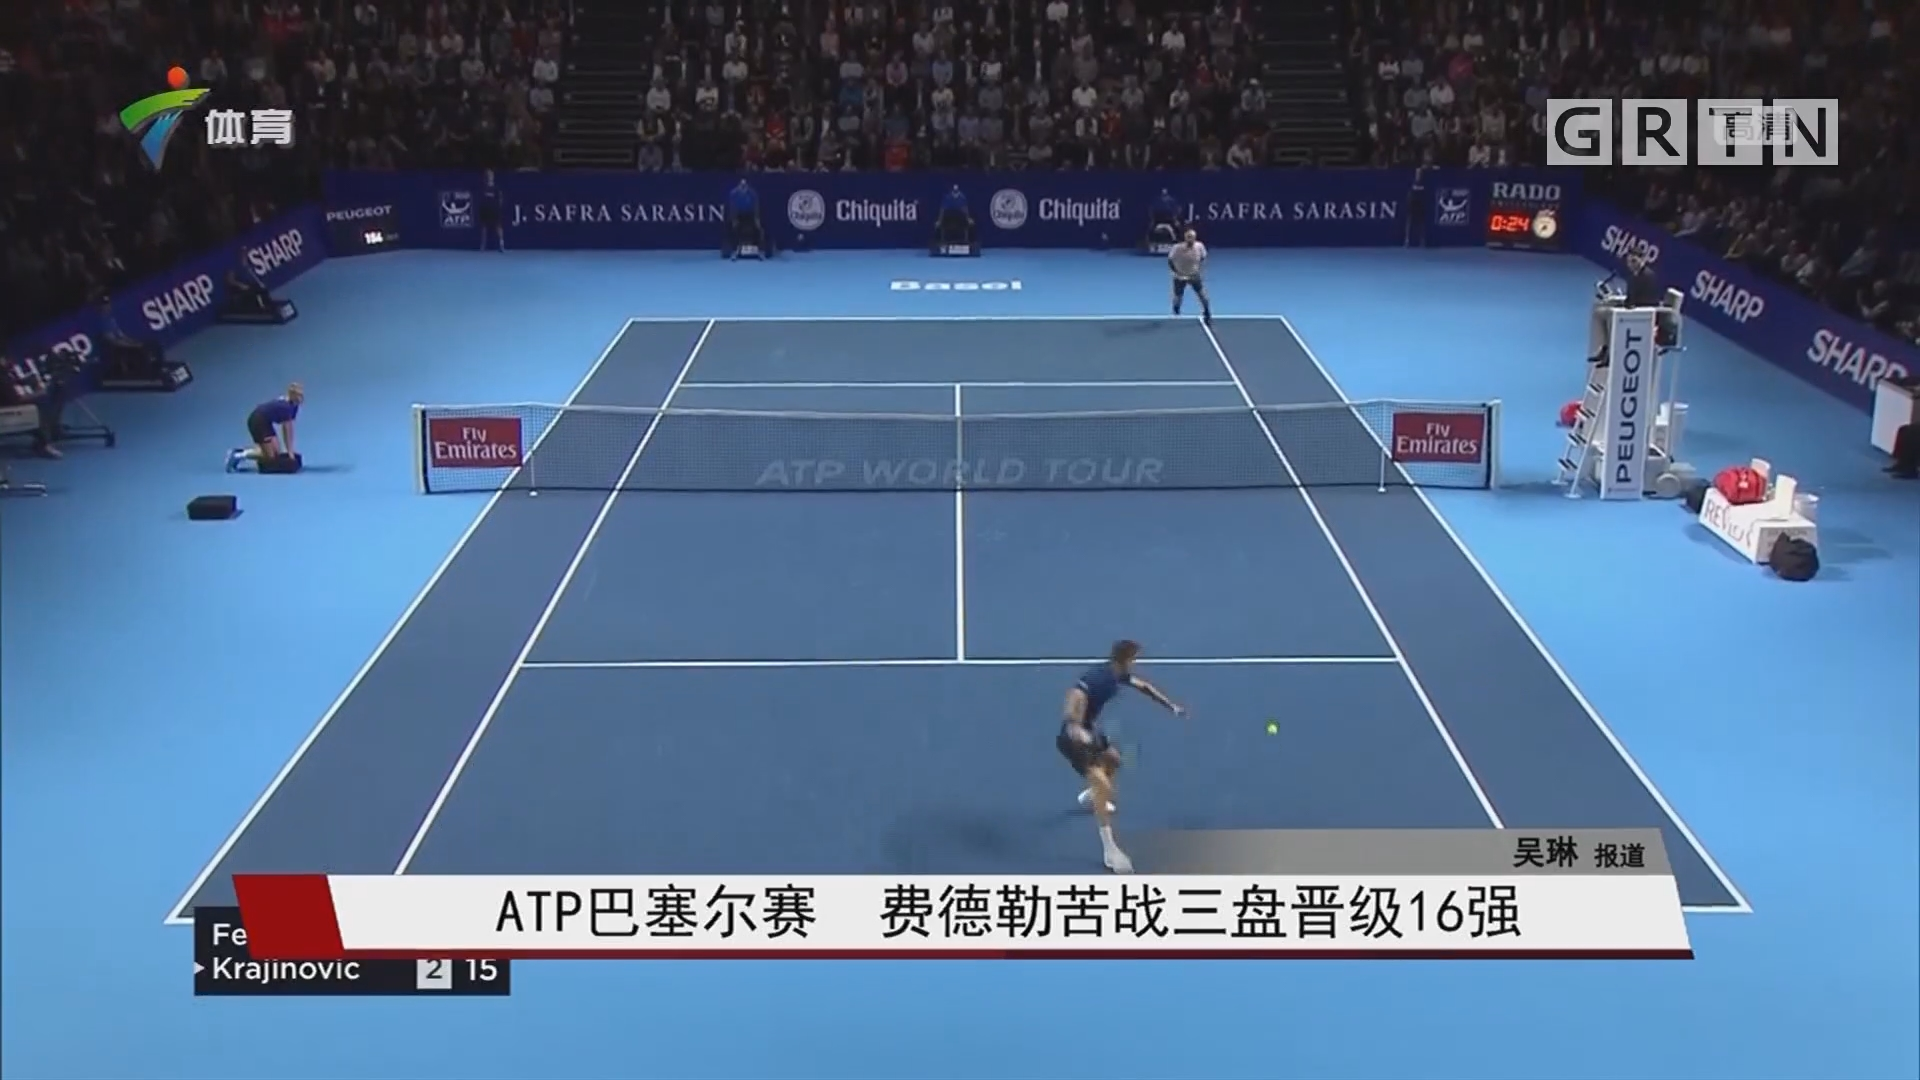 ATP巴塞尔赛 费德勒苦战三盘晋级16强